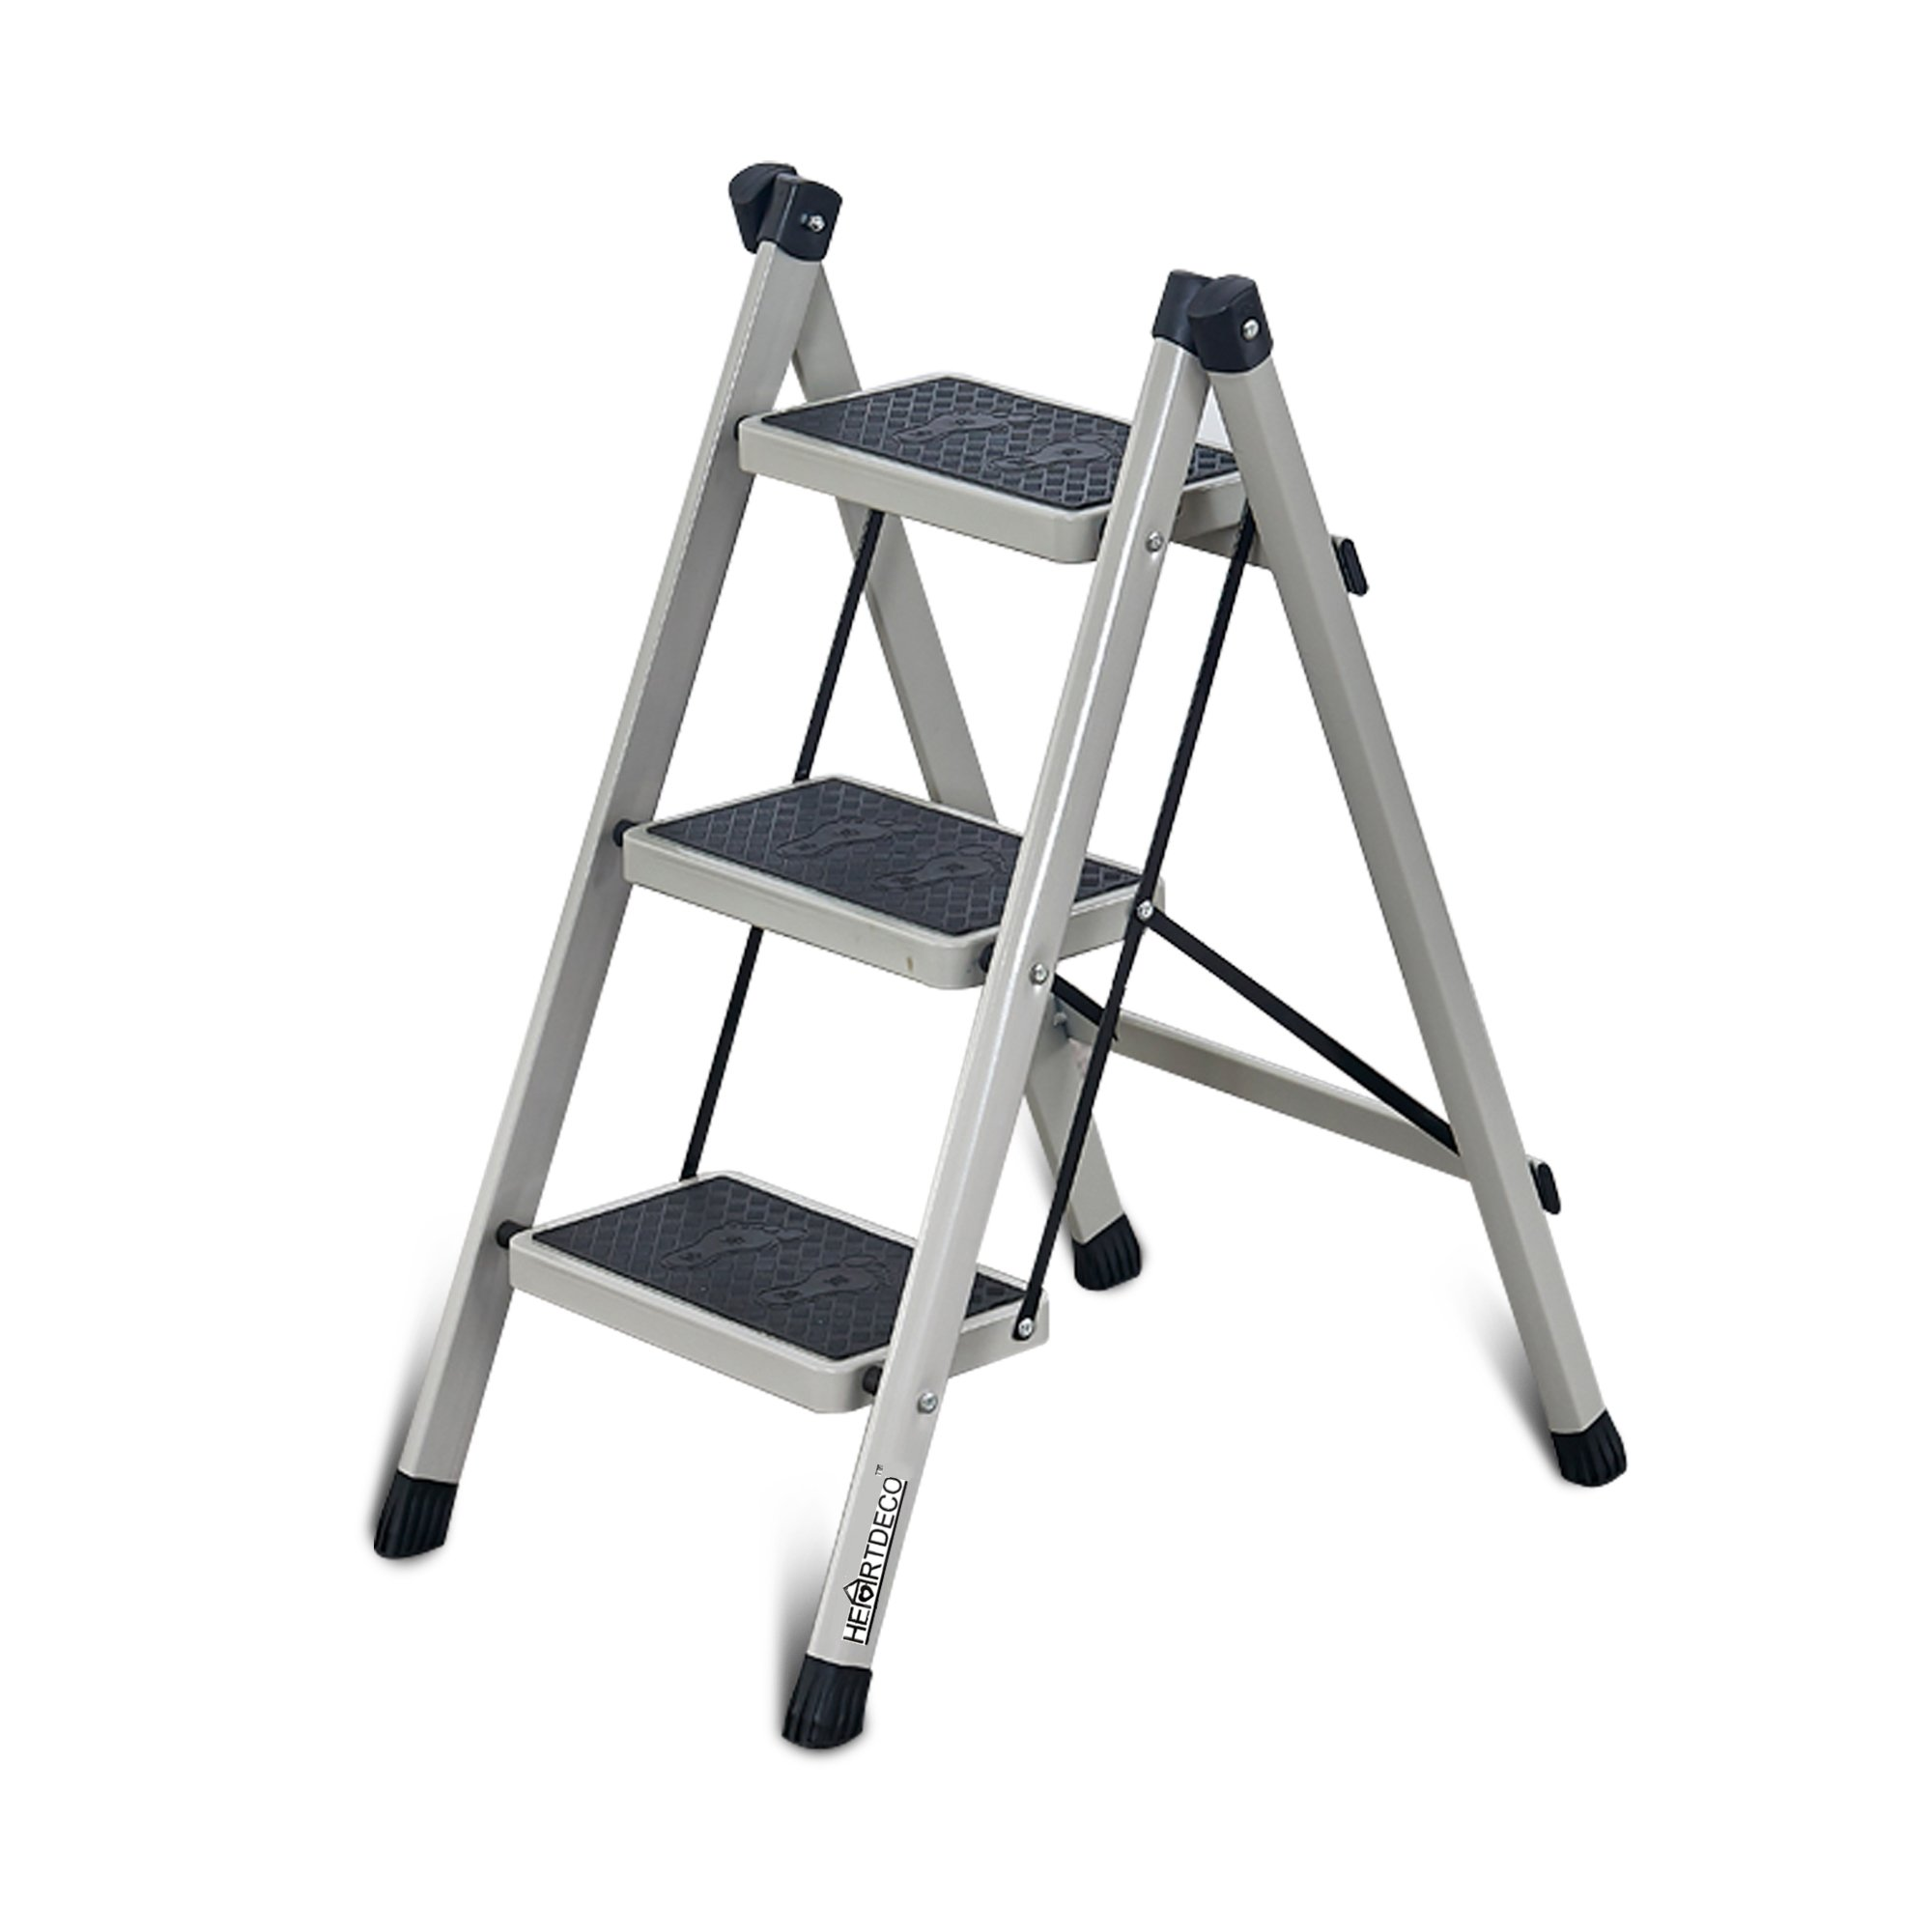 Portable Folding 3 Step Stool Ladder